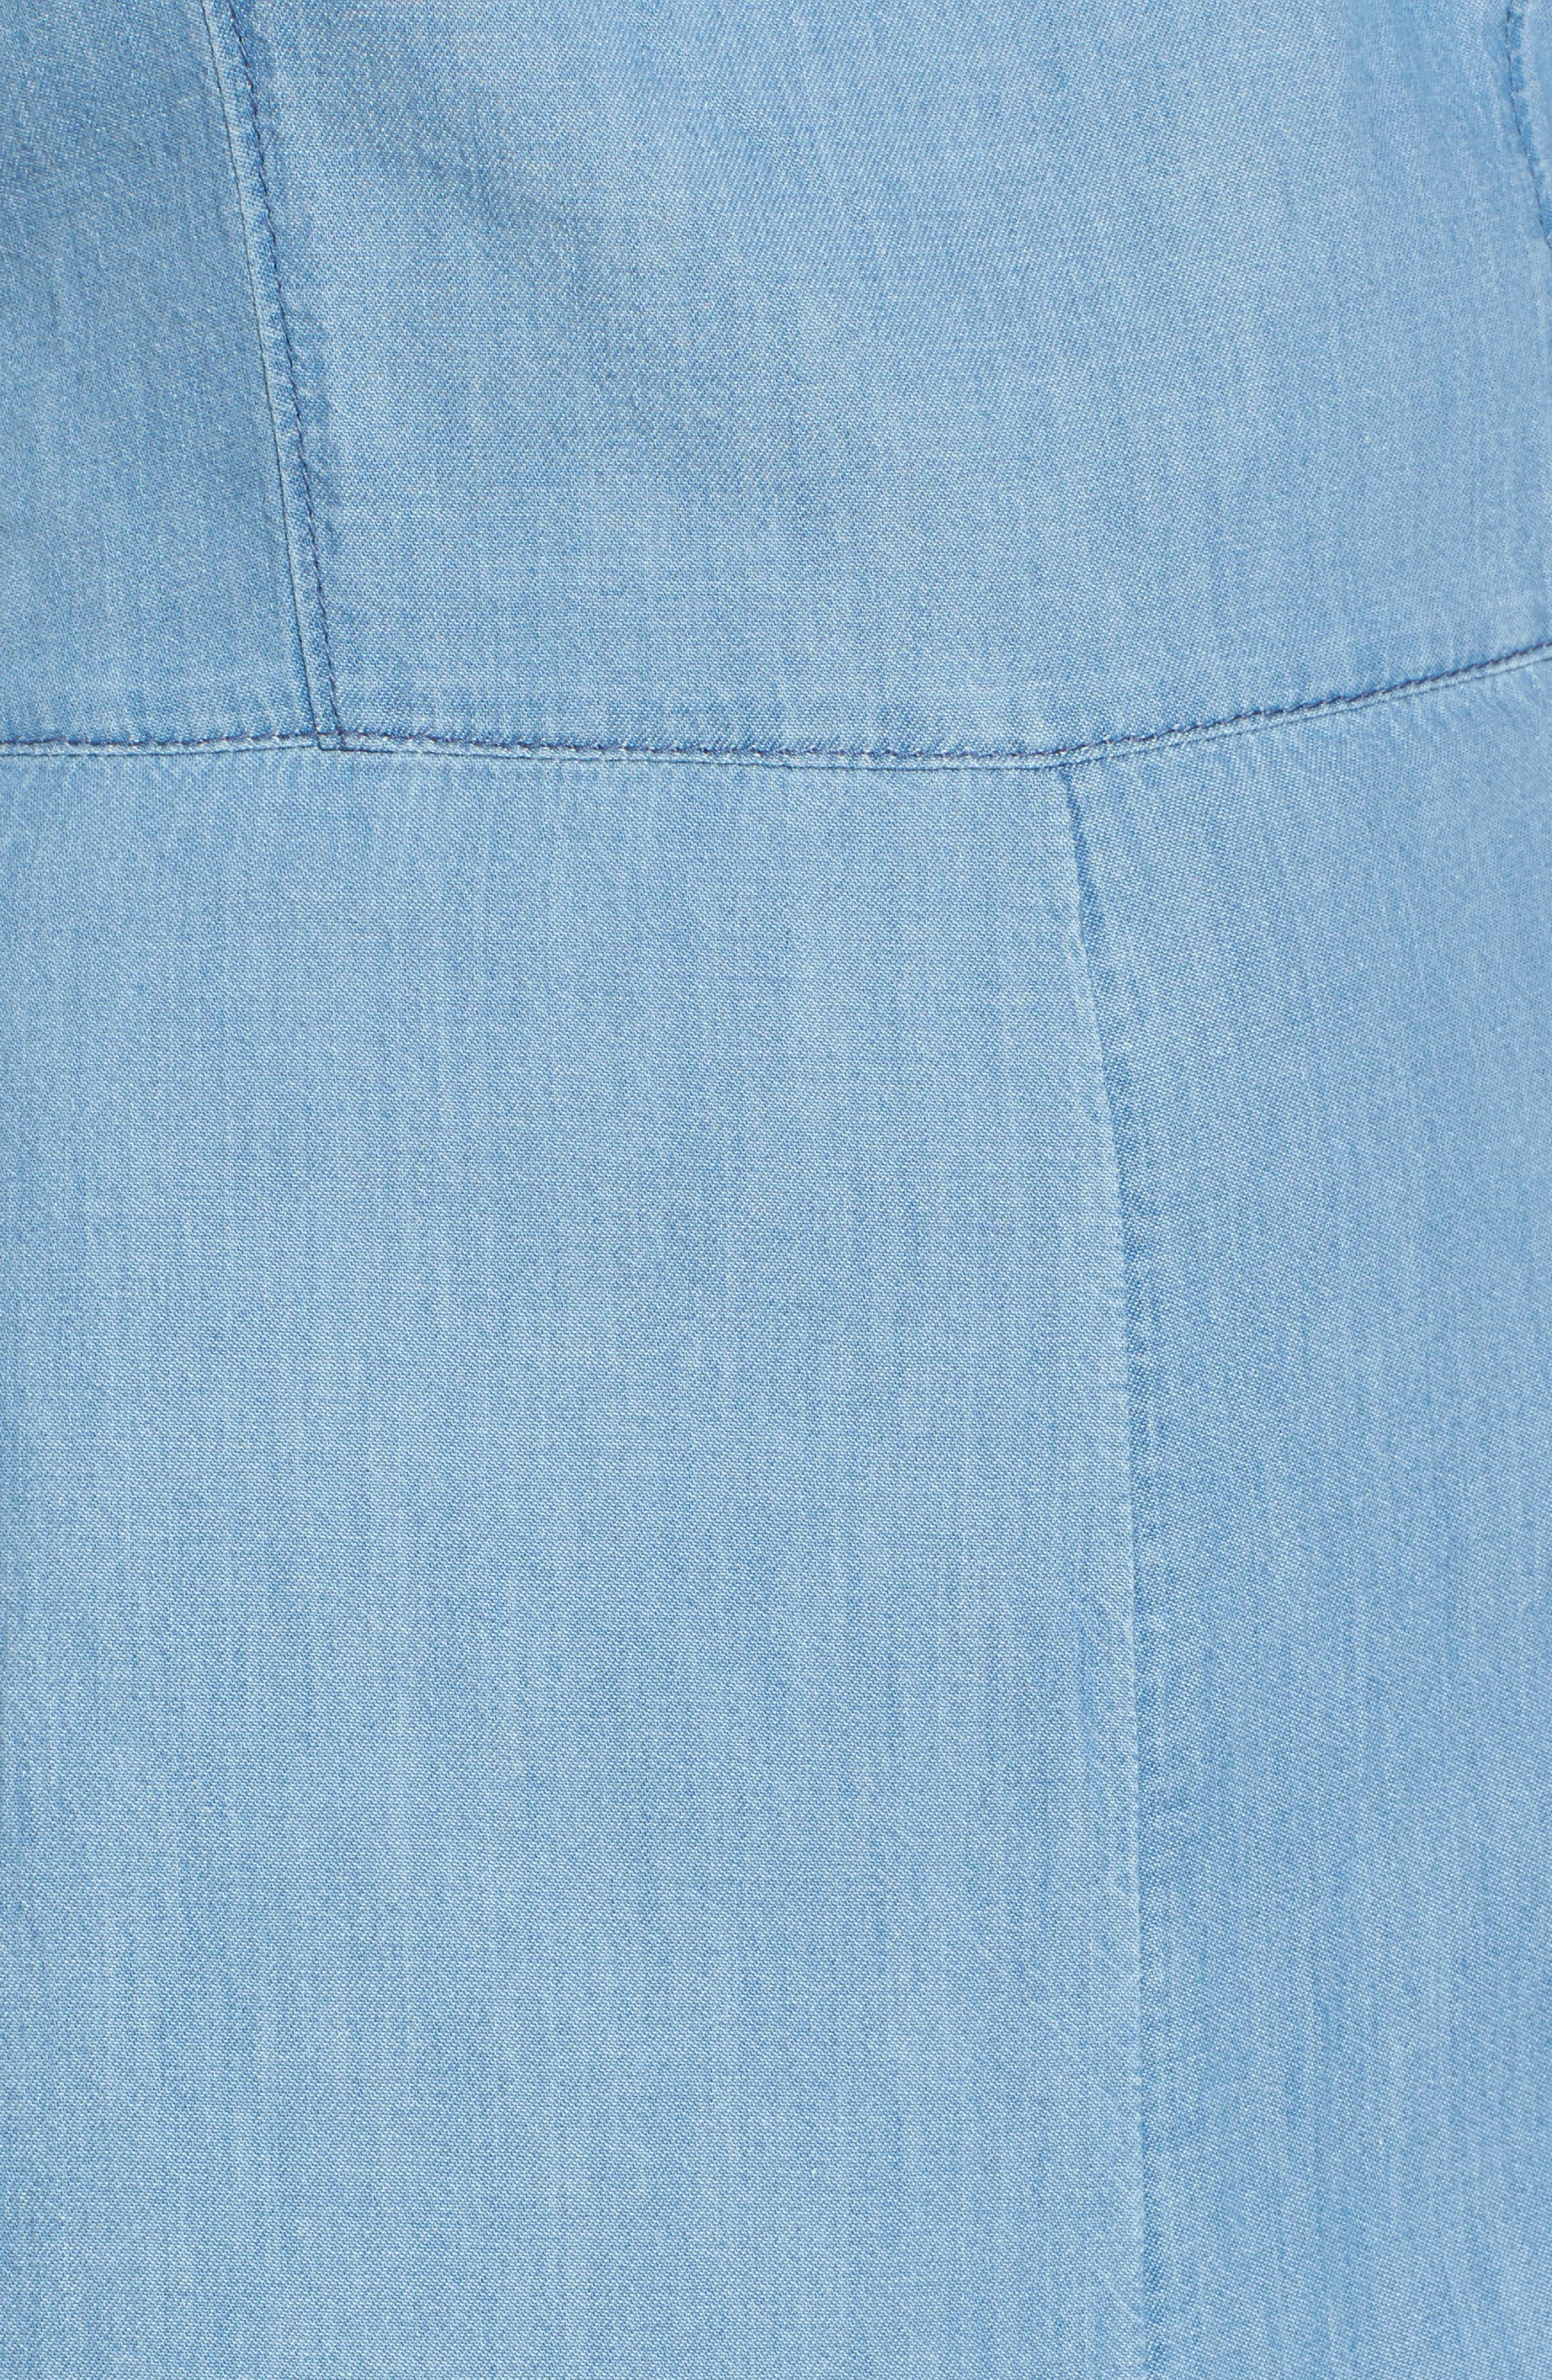 Chambray Apron Crop Jumpsuit,                             Alternate thumbnail 5, color,                             Medium Light Wash